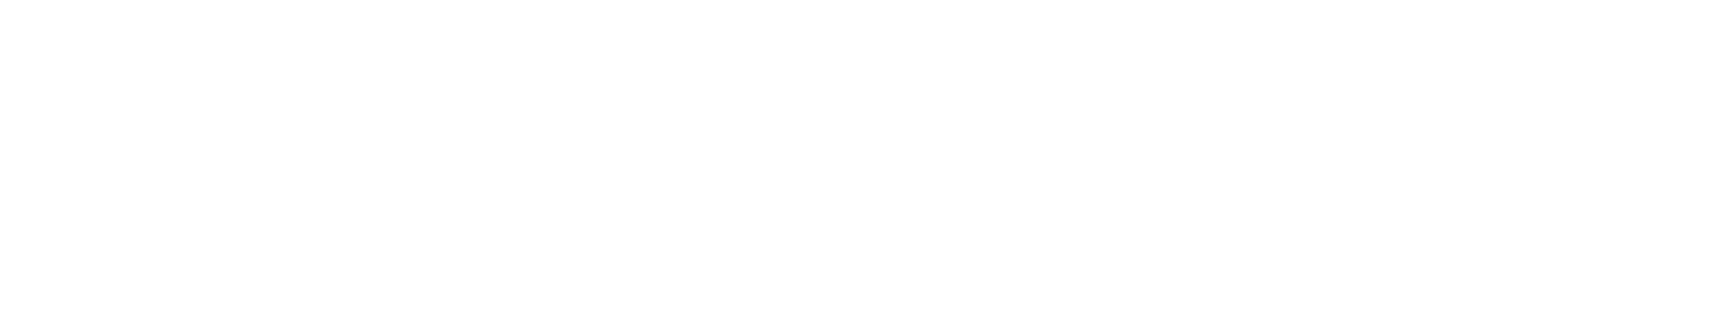 Seismic 2000